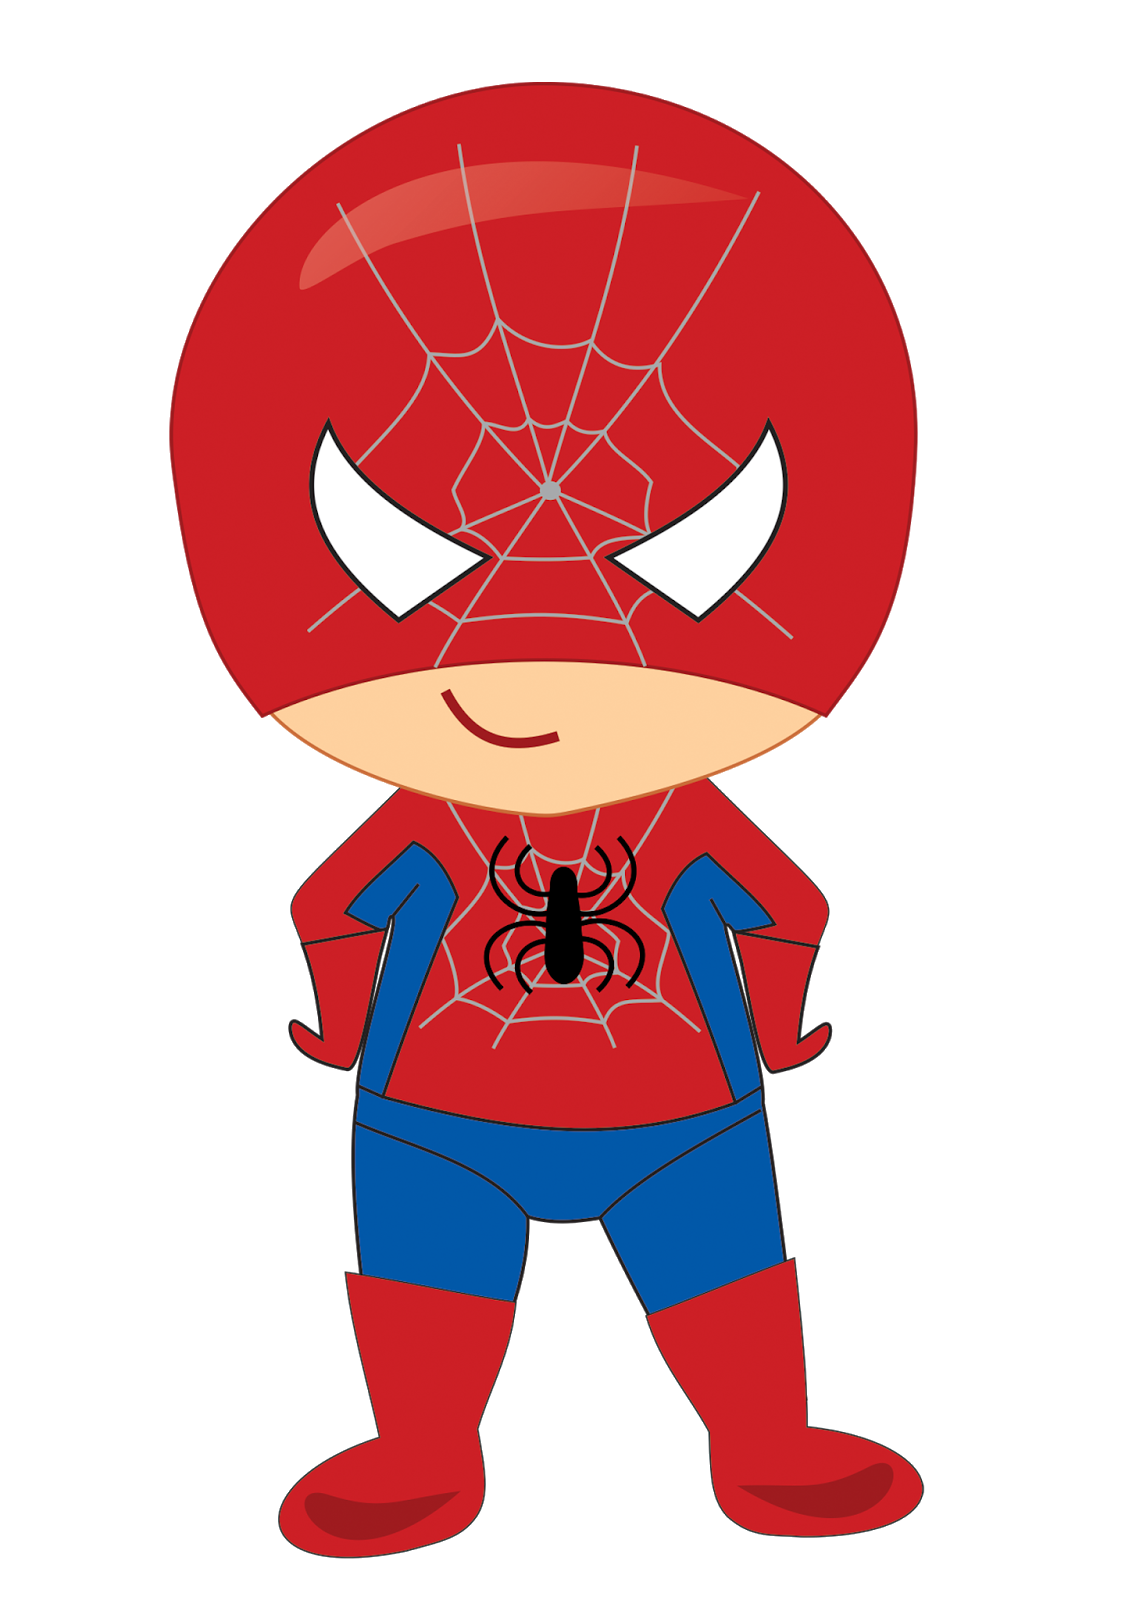 Superhero turkey clipart